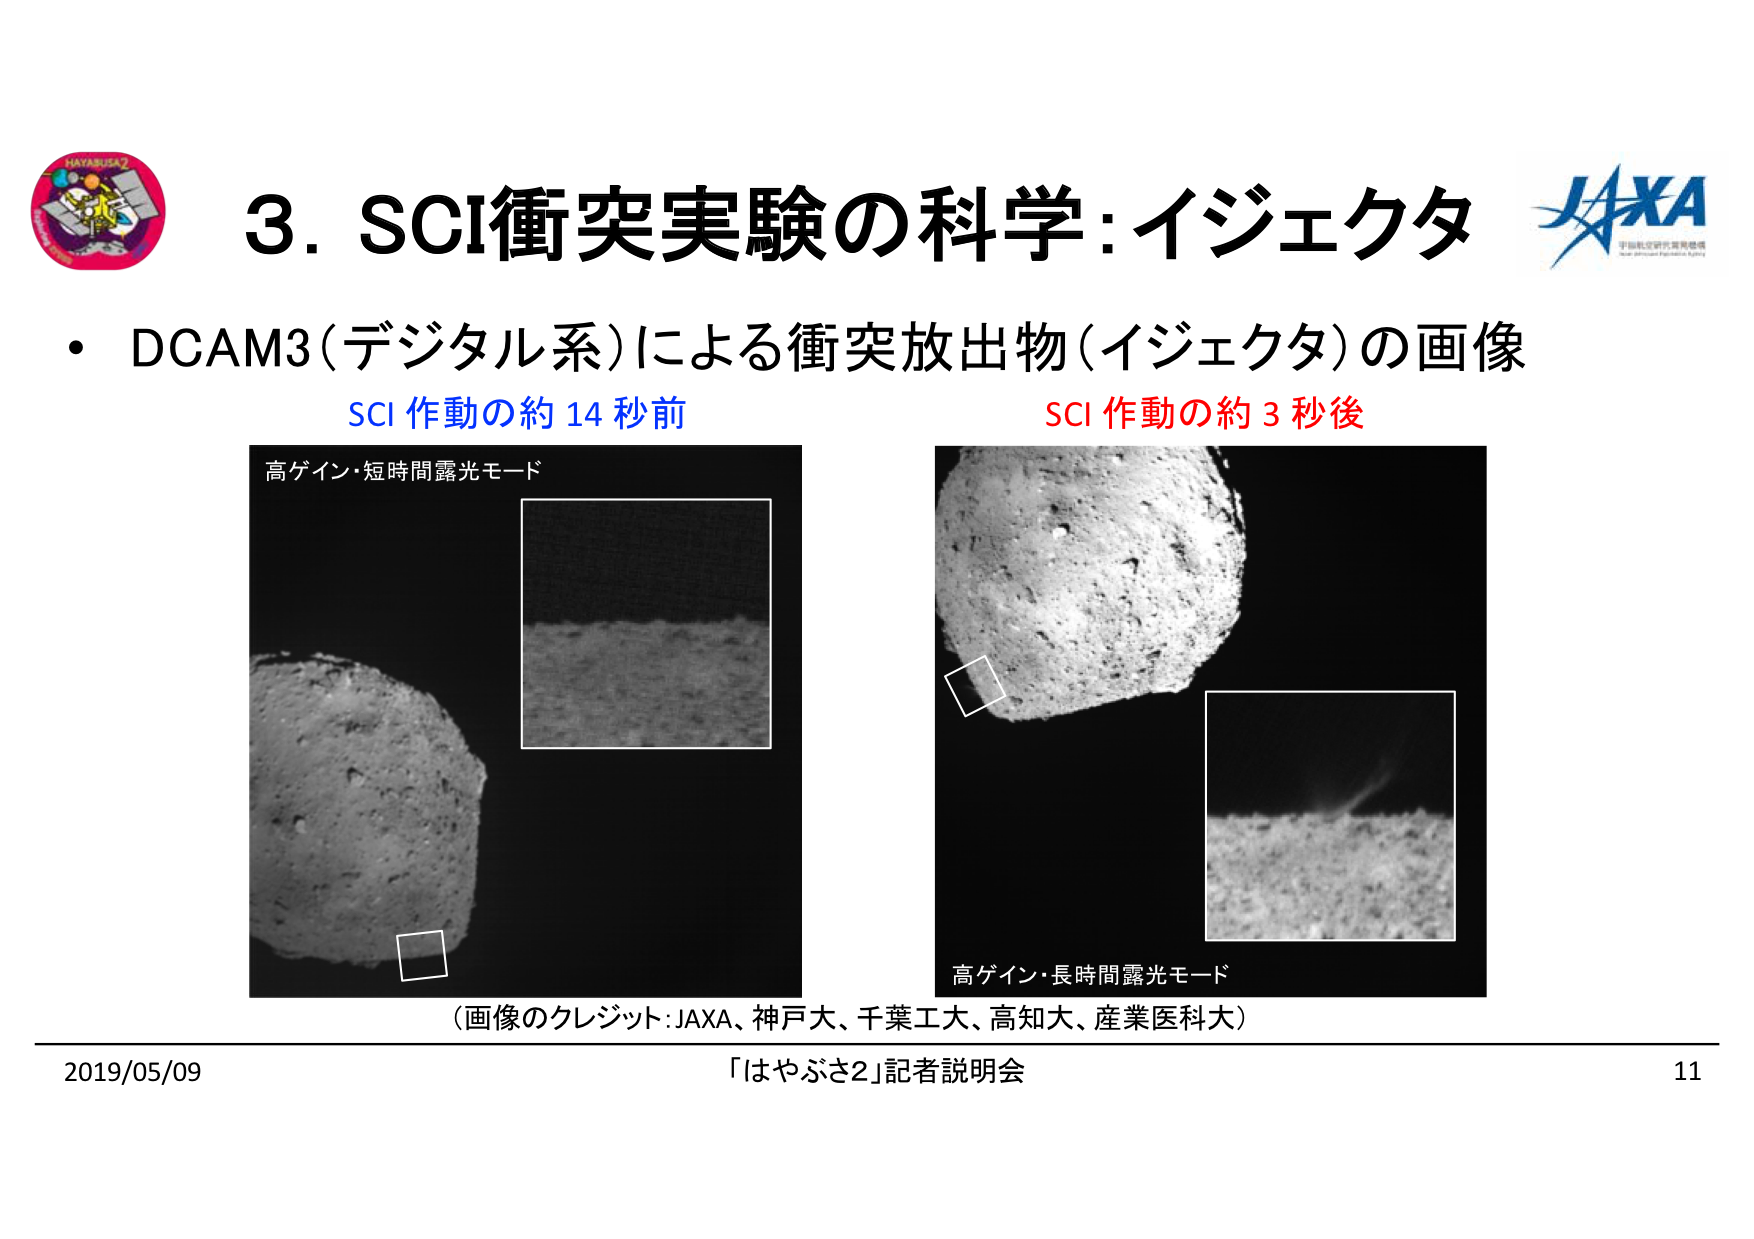 f:id:Imamura:20190509154407p:plain